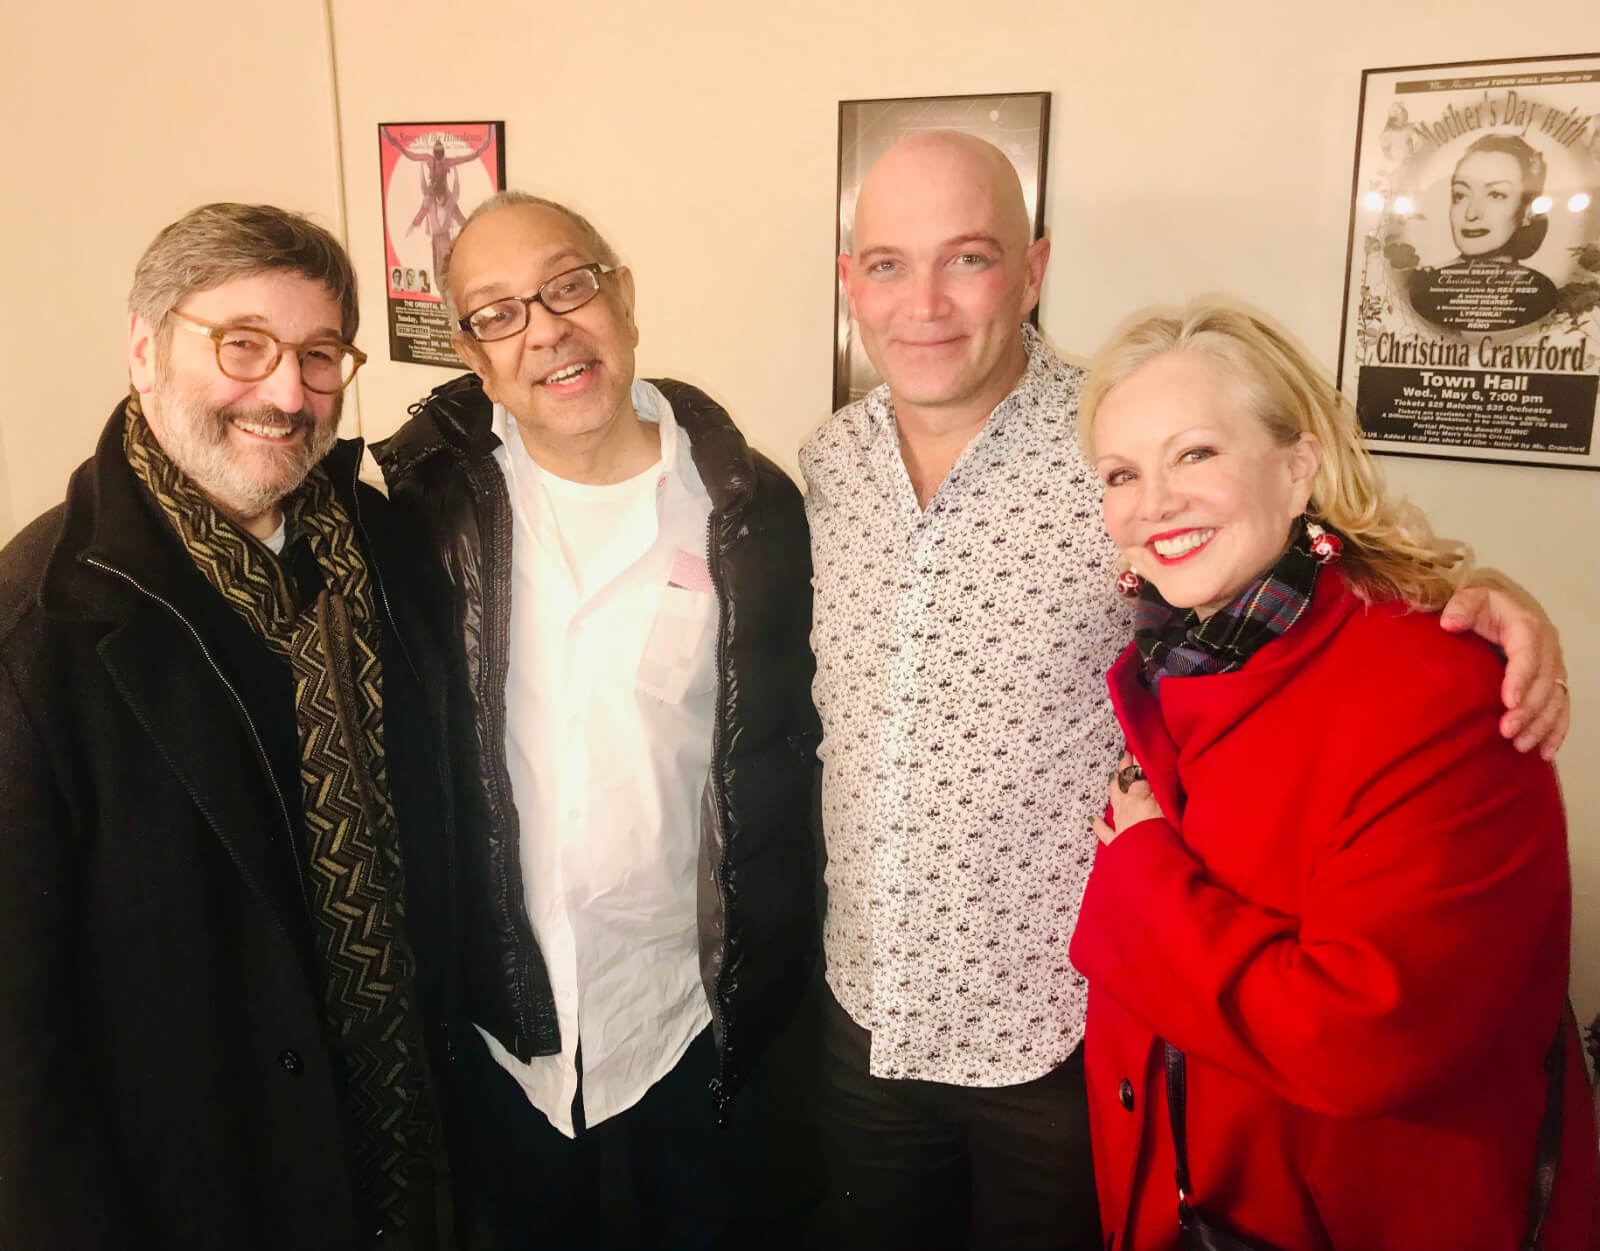 Santo Loquasto, George C. Wolfe, Taylor Mac, and Susan Stroman backstage.